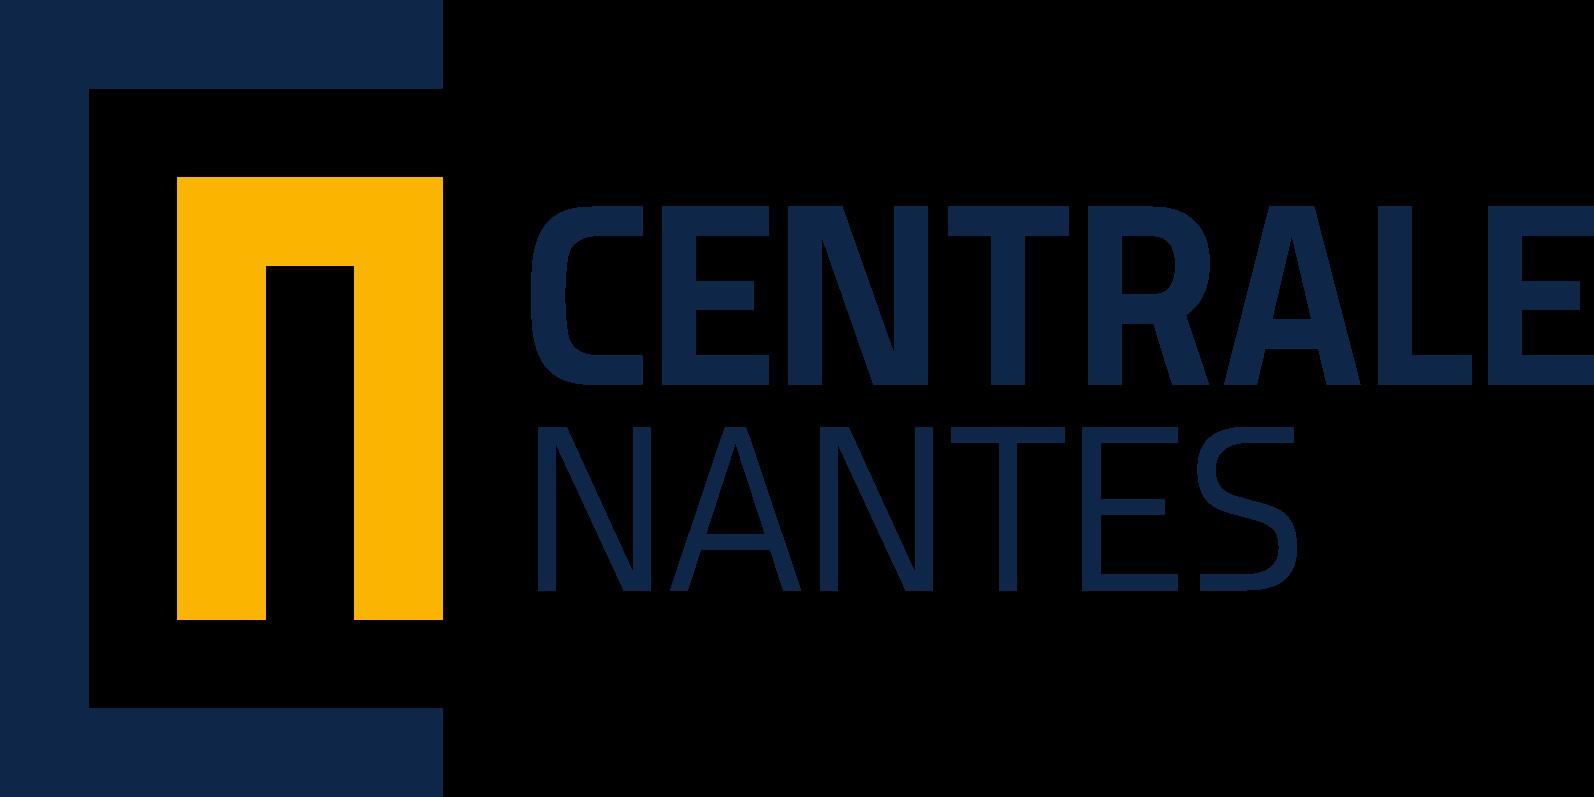 Centrale Nantes